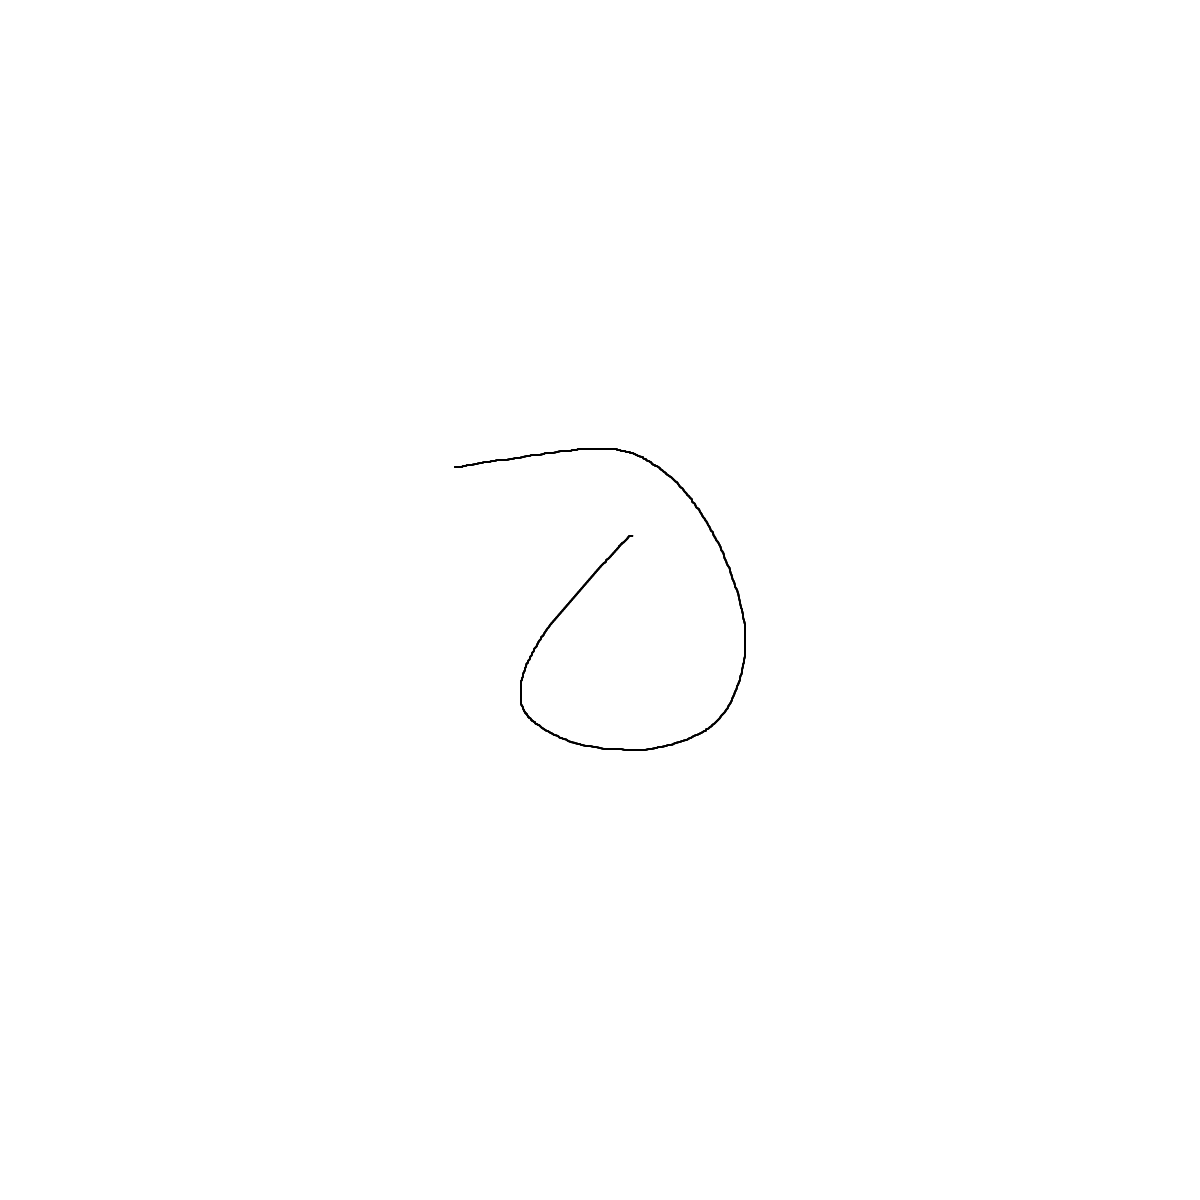 BAAAM drawing#6571 lat:43.2289085388183600lng: -79.8382110595703100